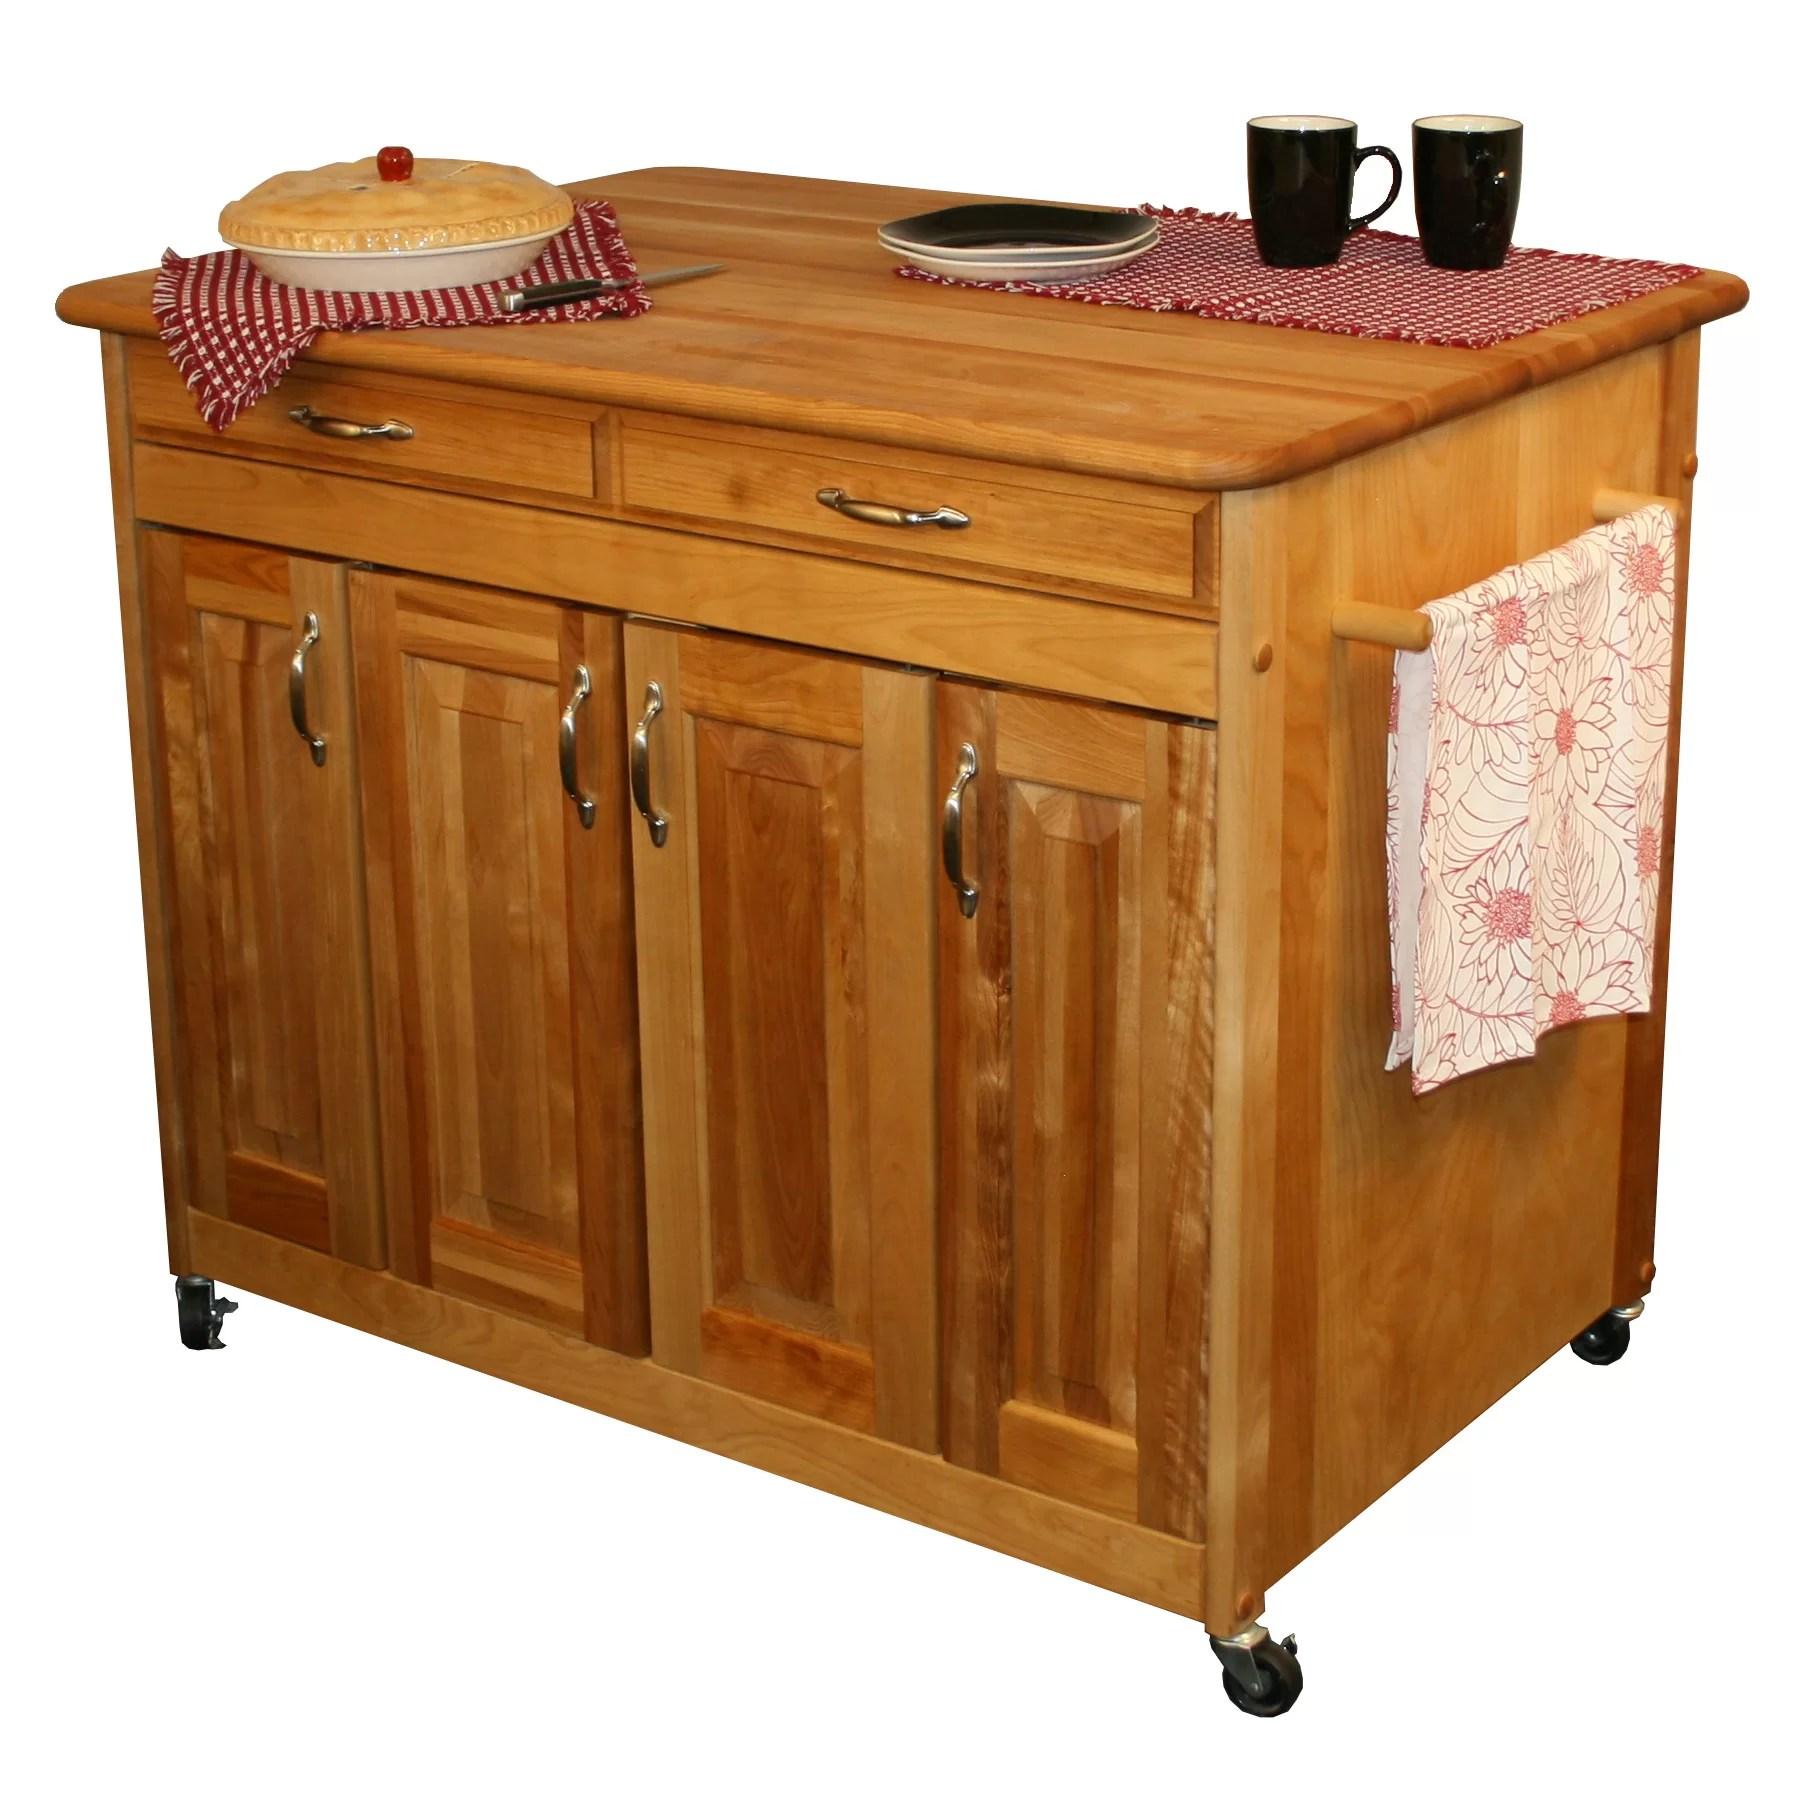 catskill craftsmen kitchen island portable with butcher block top